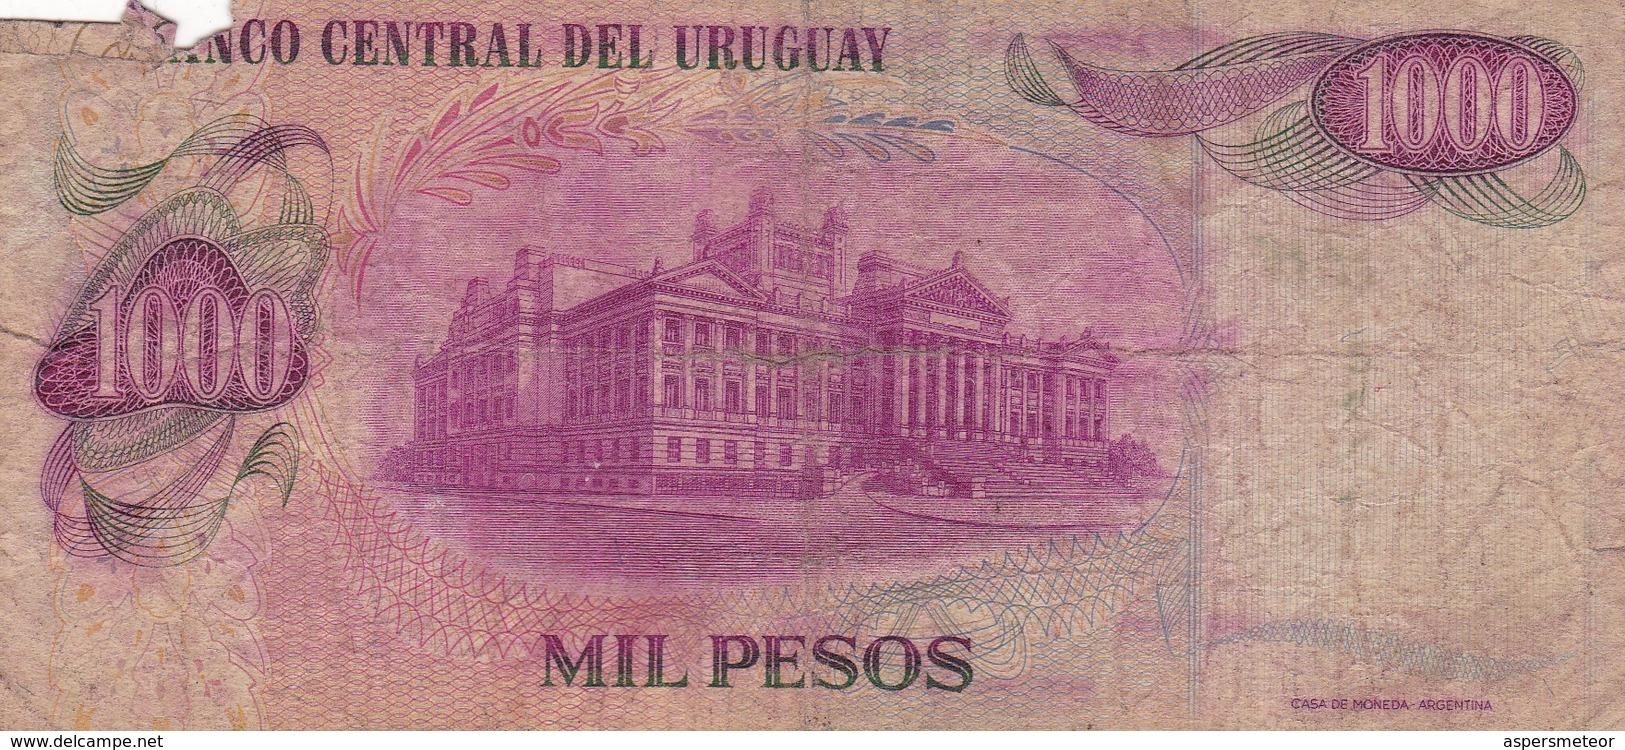 MIL PESOS, SERIE A ARTIGAS. URUGUAY. CIRCA 1970s-BILLETE BANKNOTE BILLET-BLEUP - Uruguay